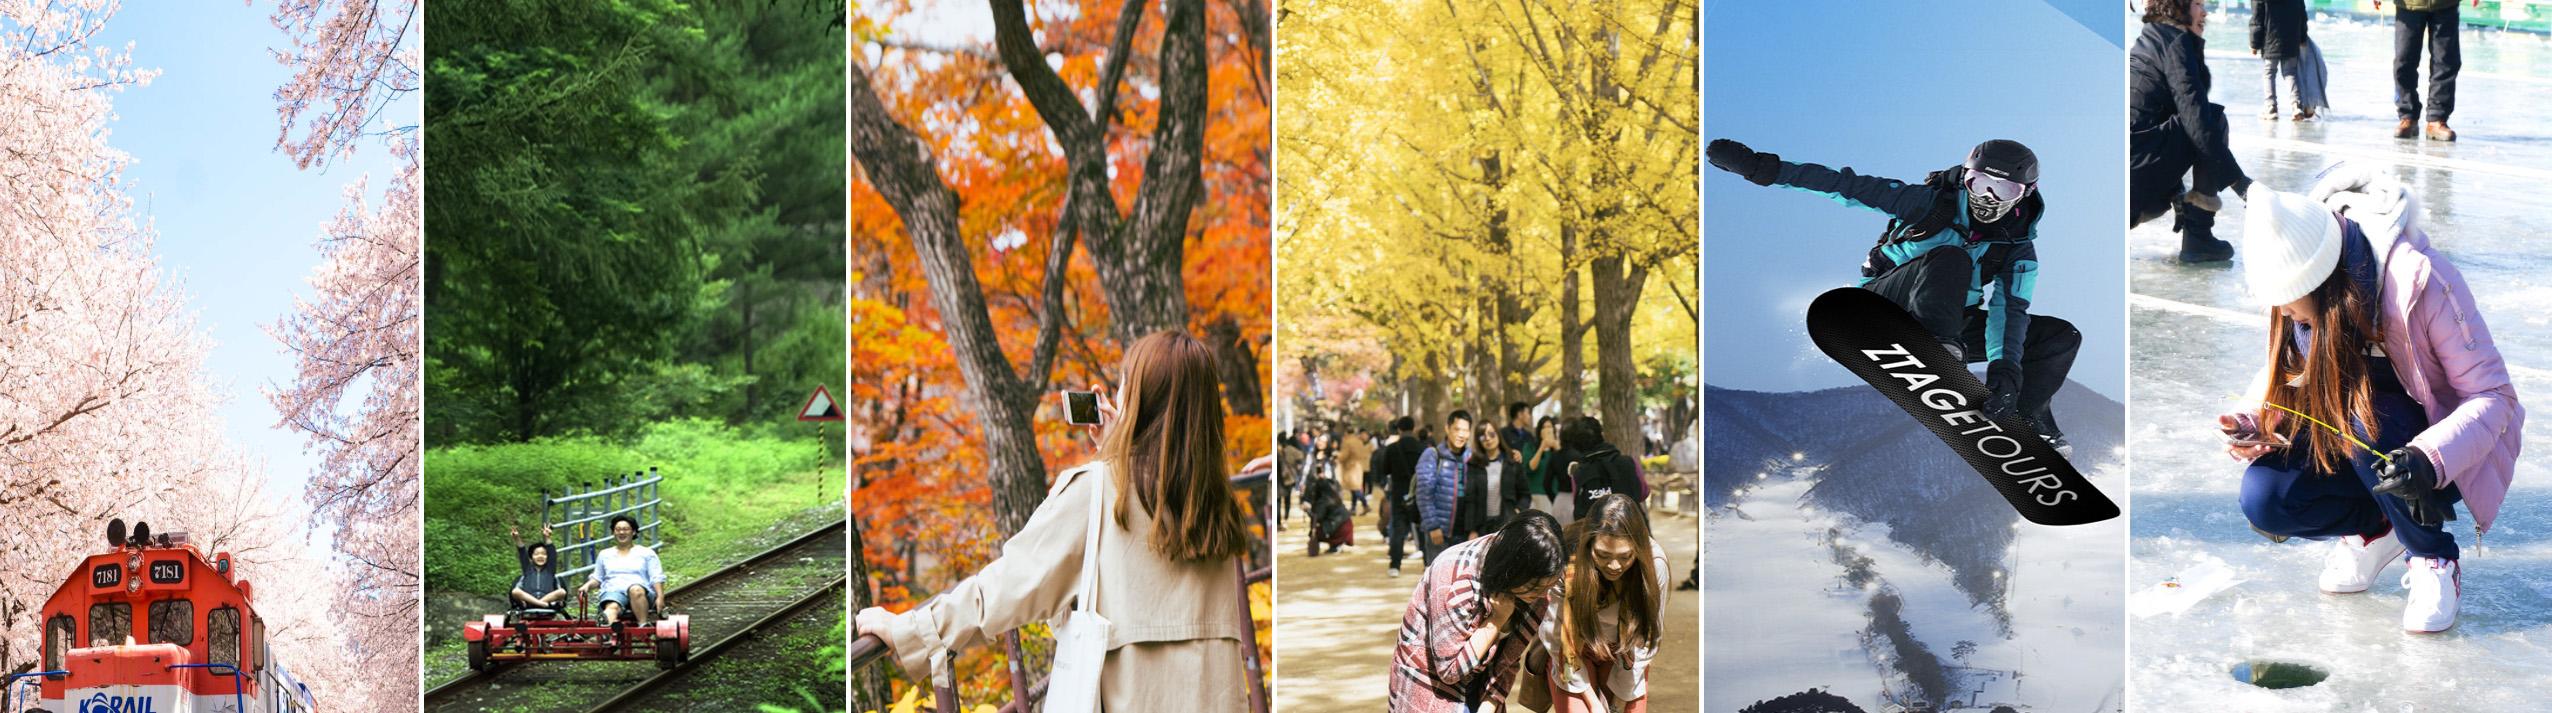 首爾一天團 Seoul Day Tour